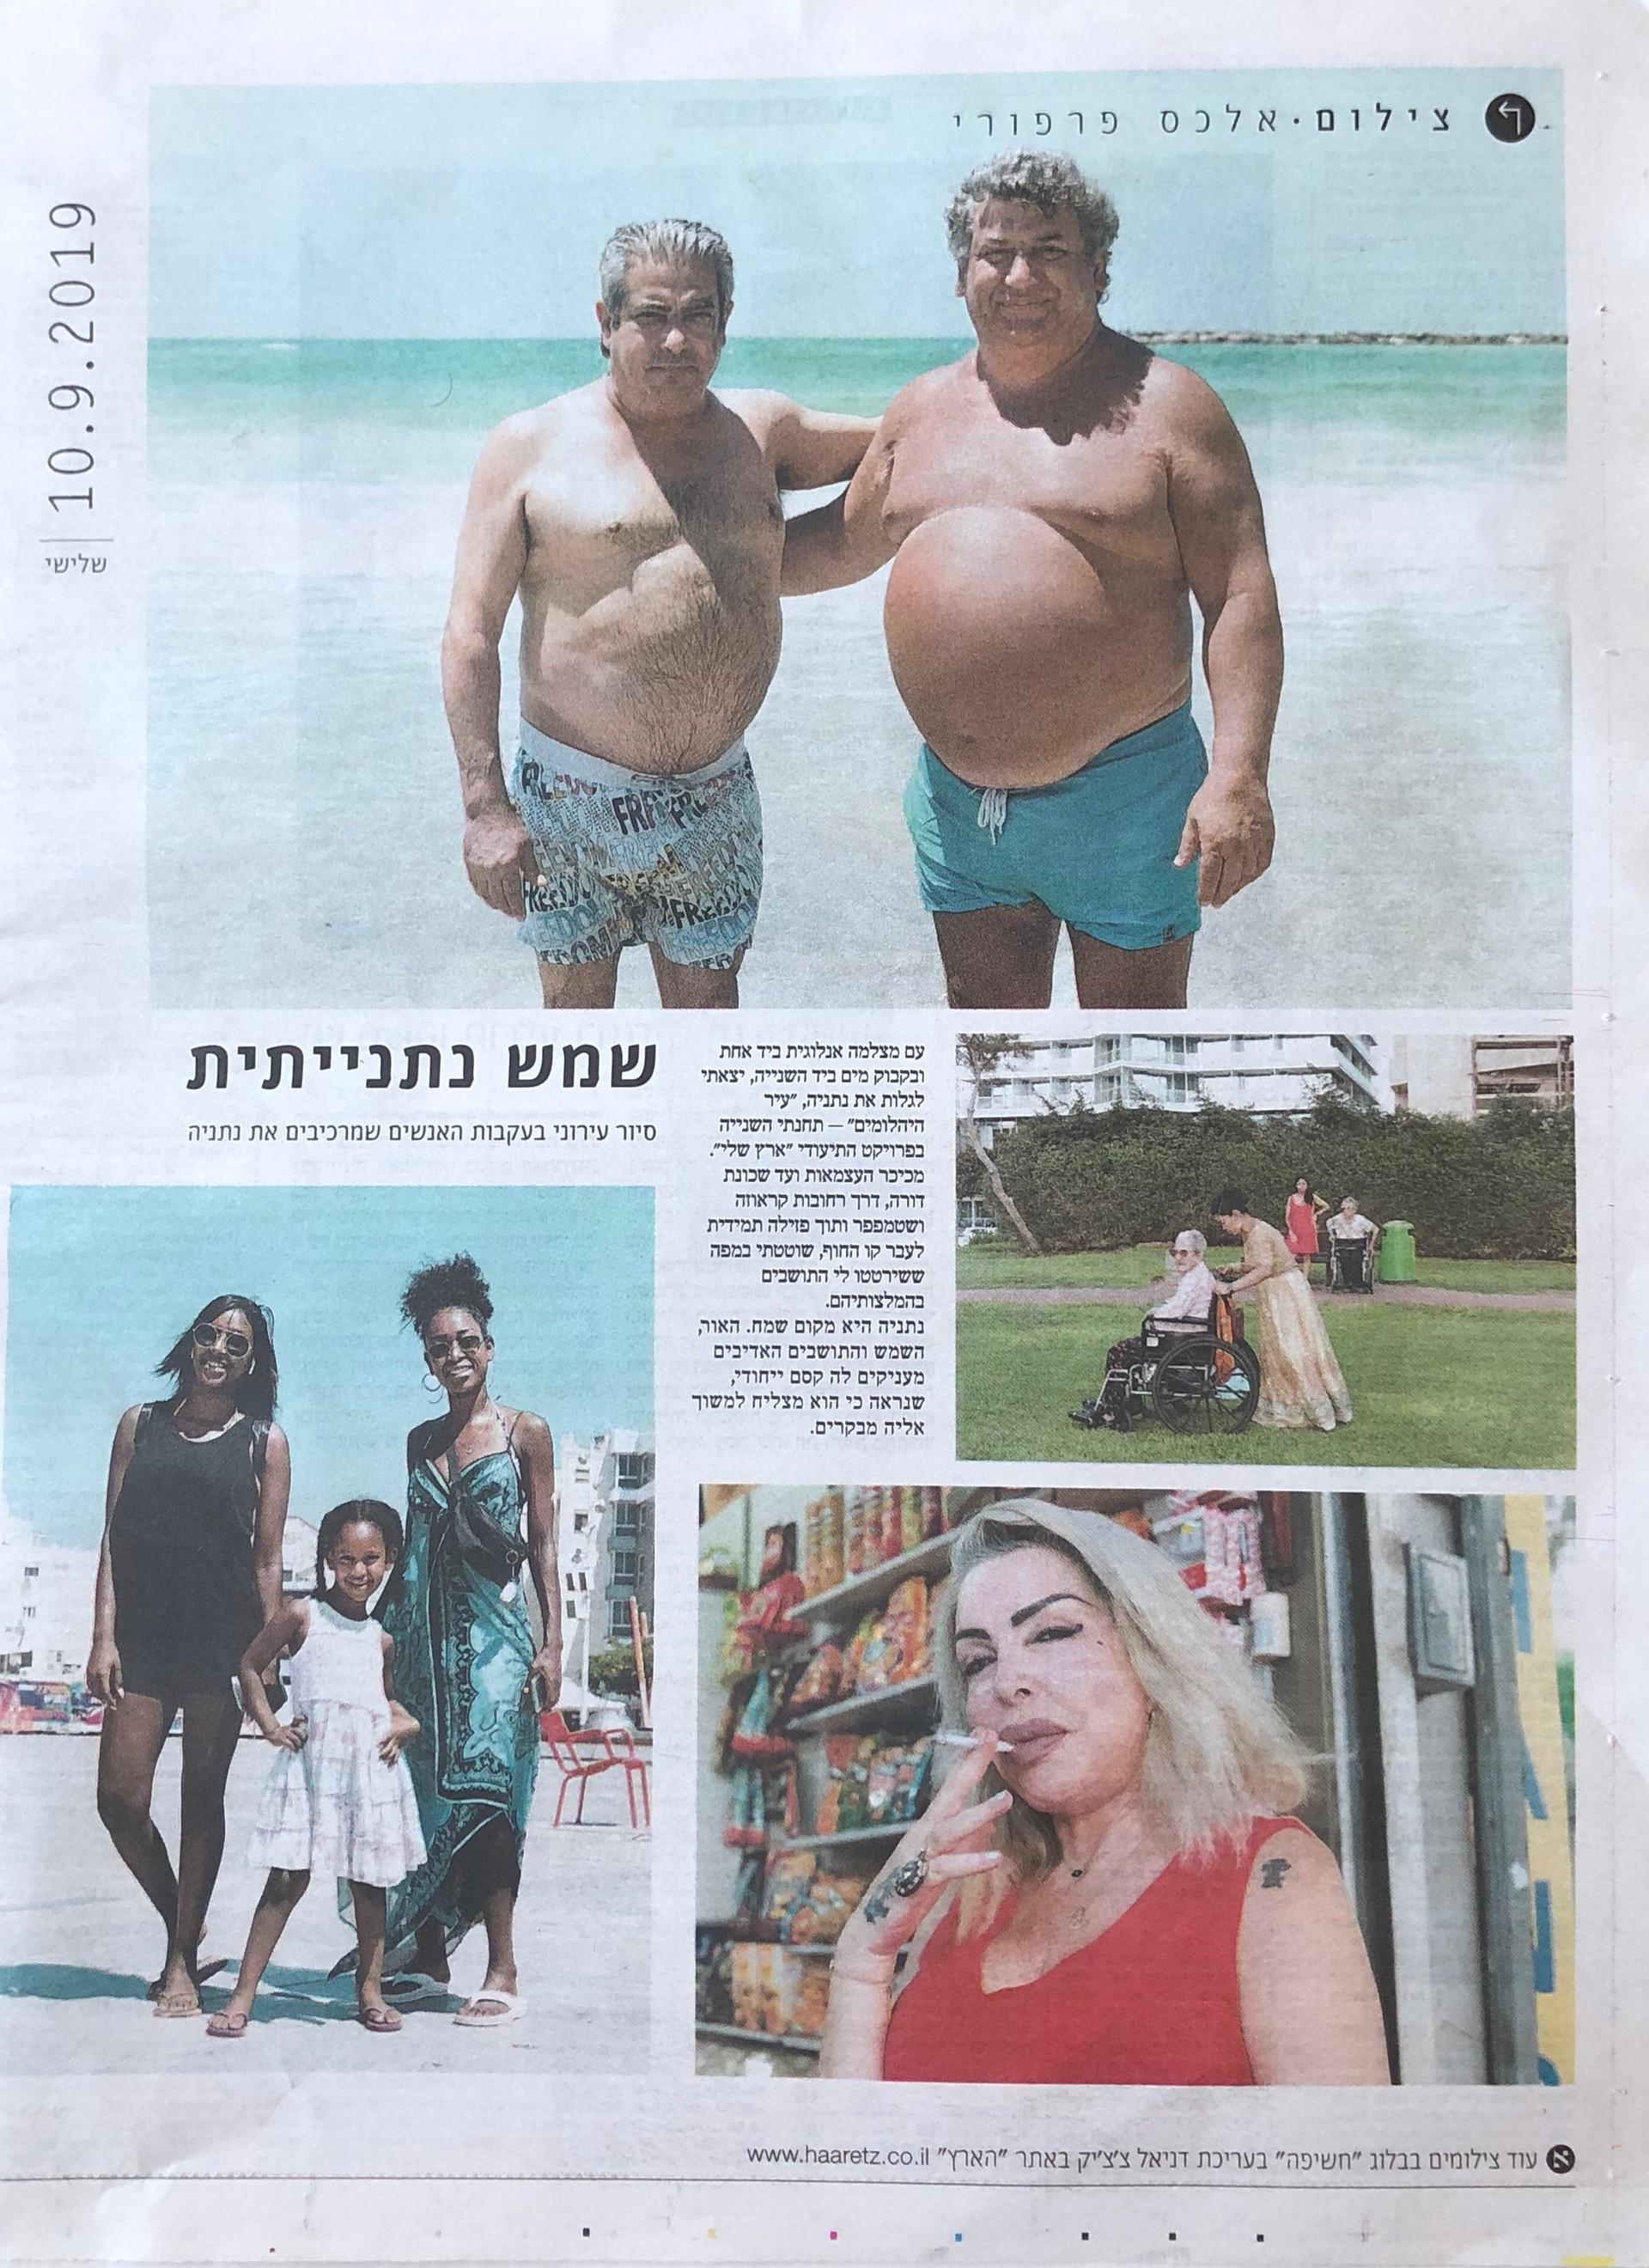 Welcome to Netanya